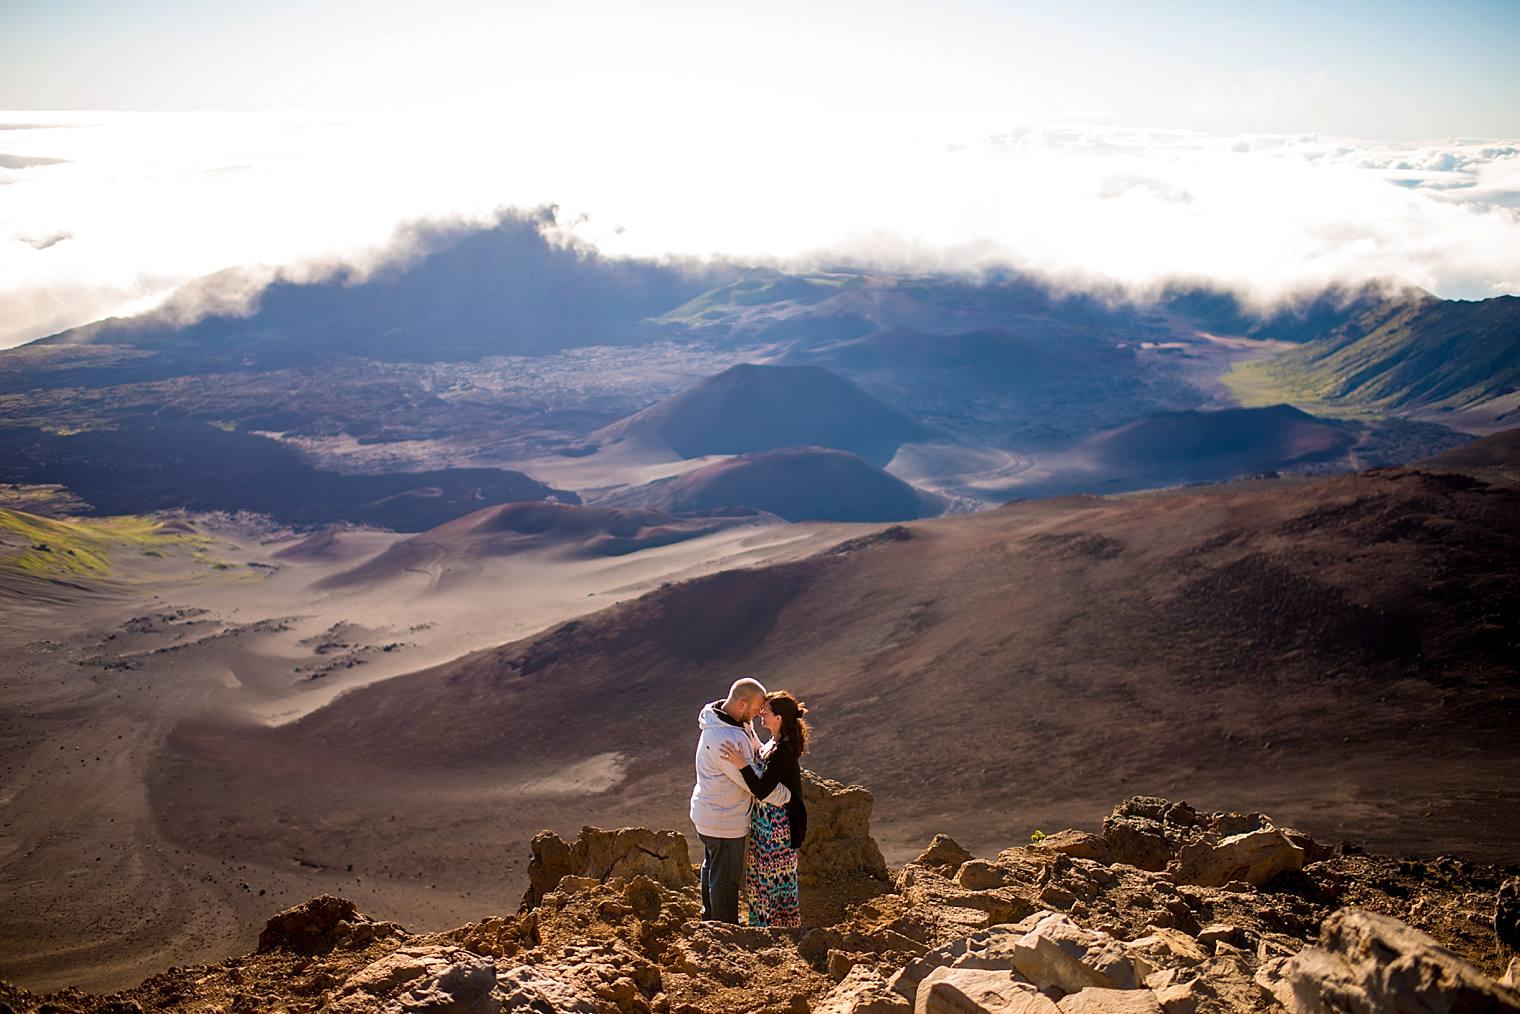 Haleakala's crater in Maui, Hawaii